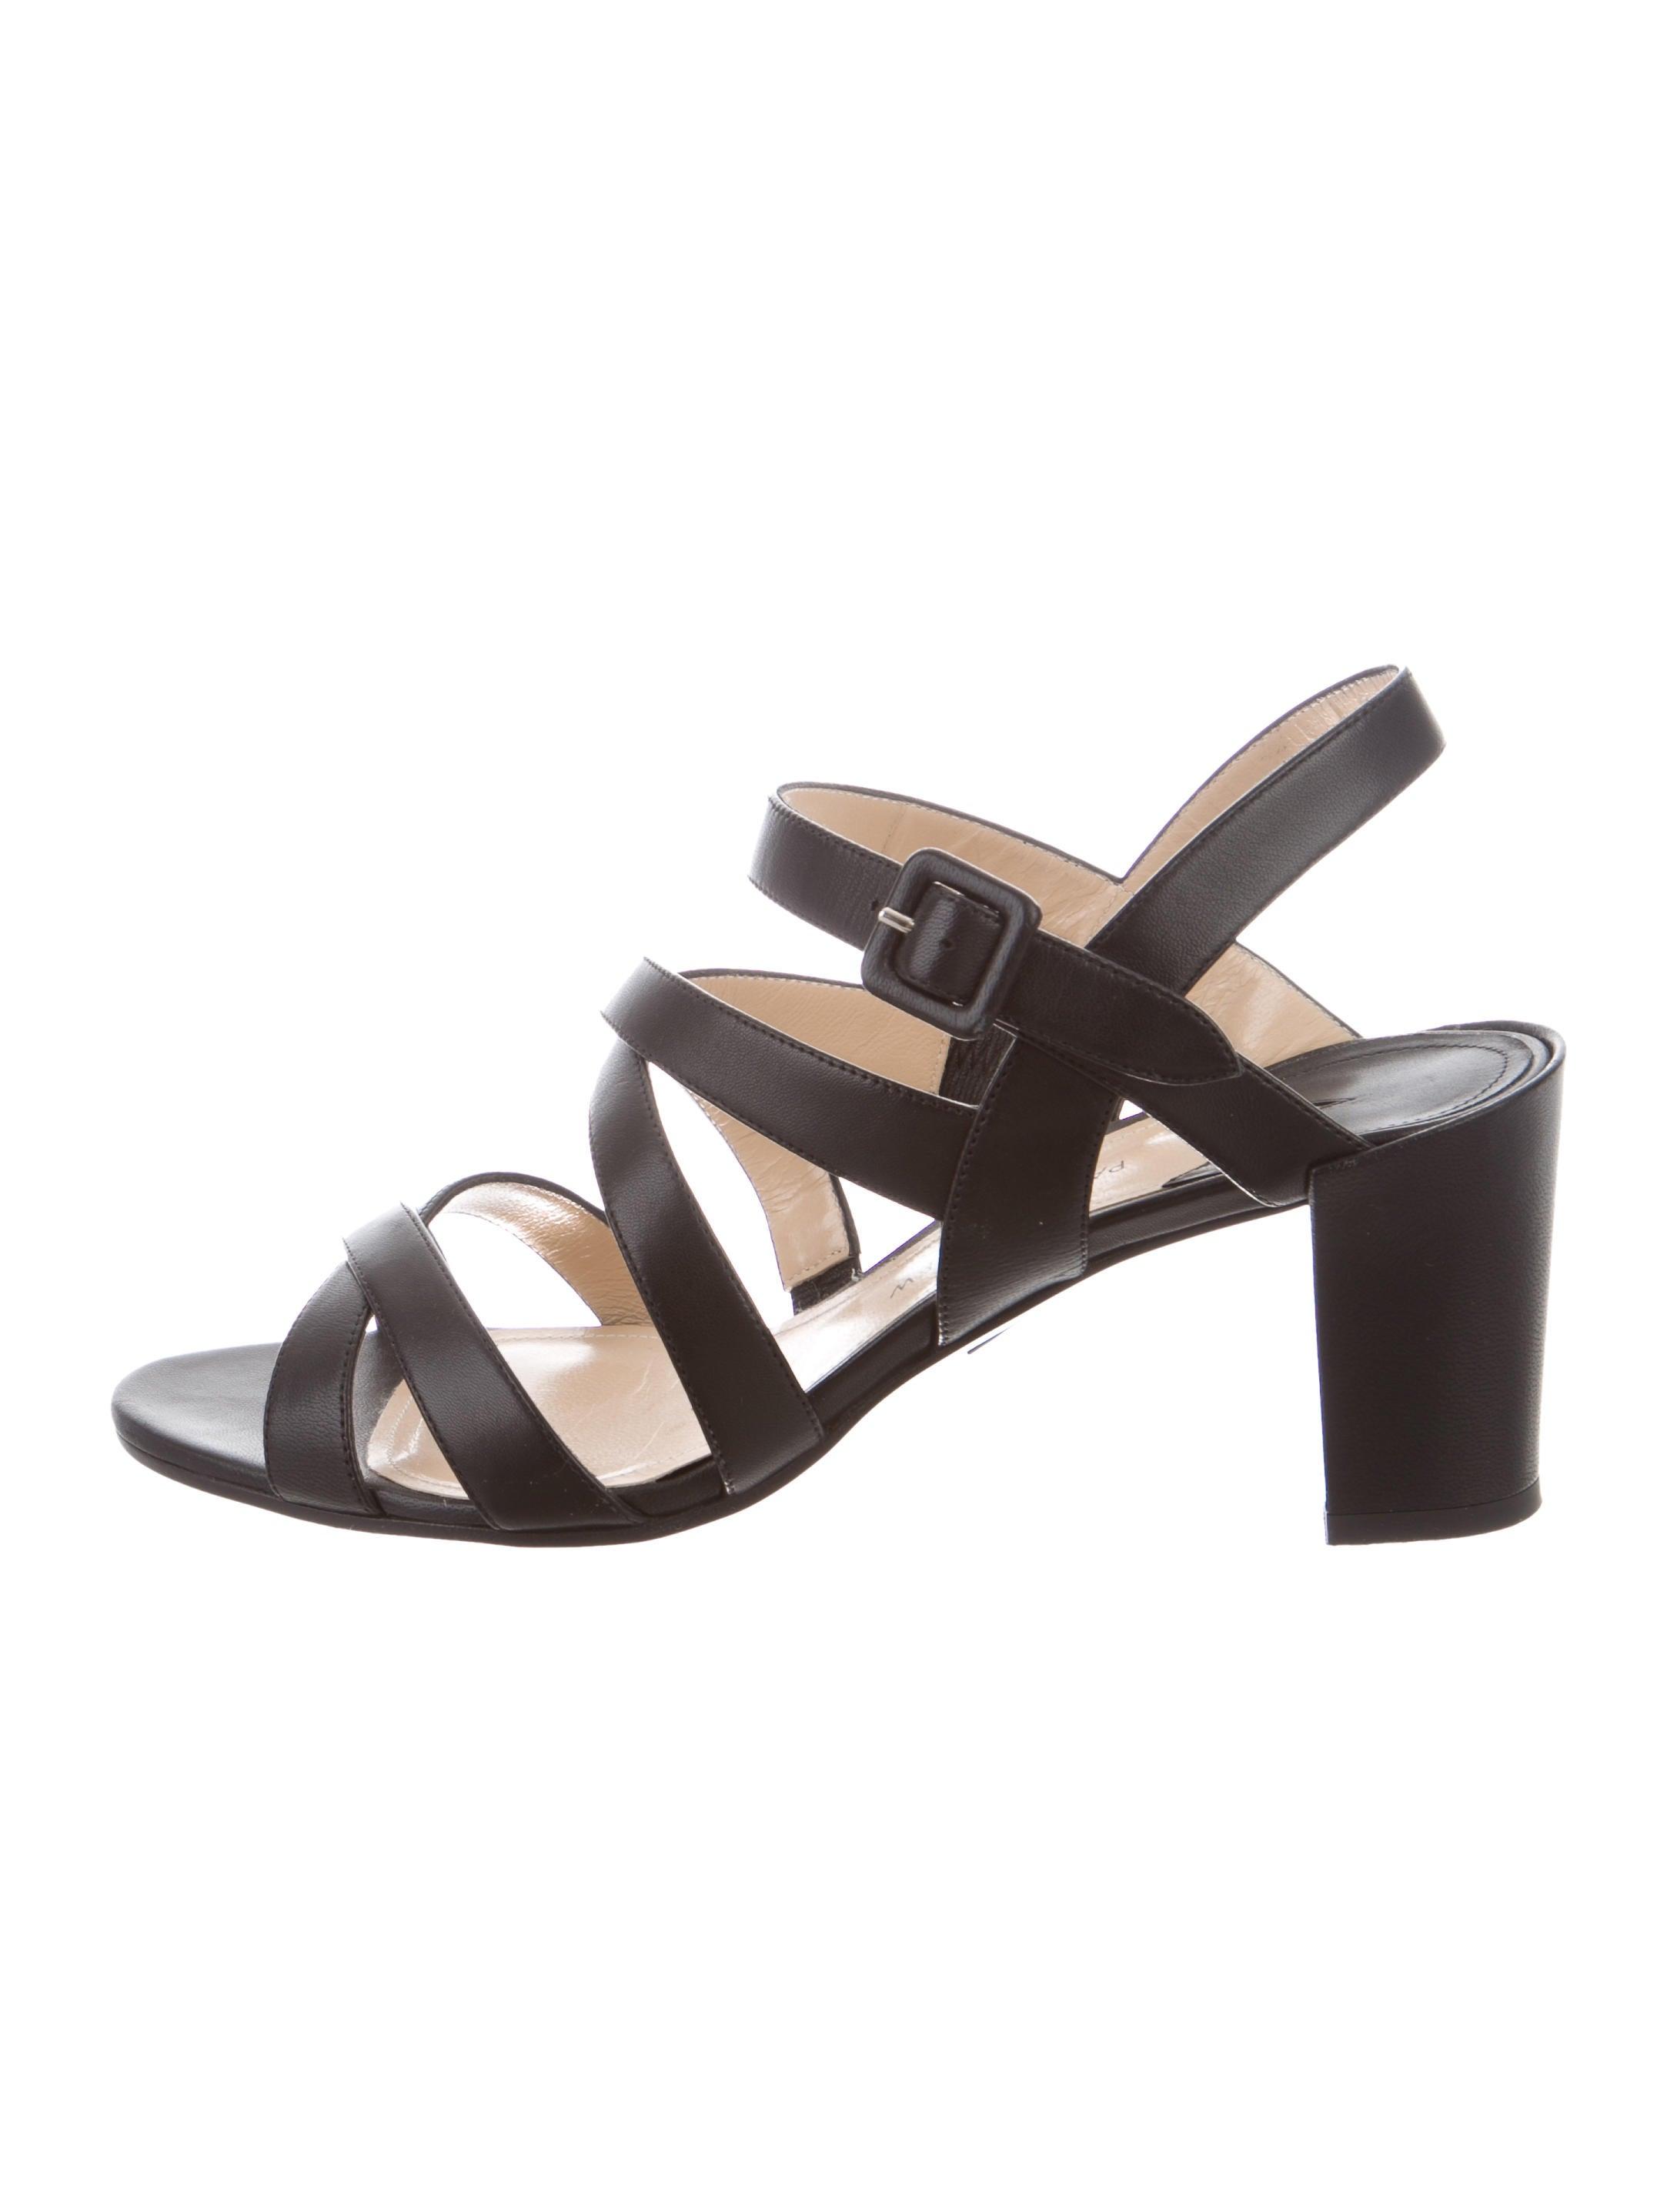 Paul Andrew 2017 Crossover Sandals discount sale online uKgamsC